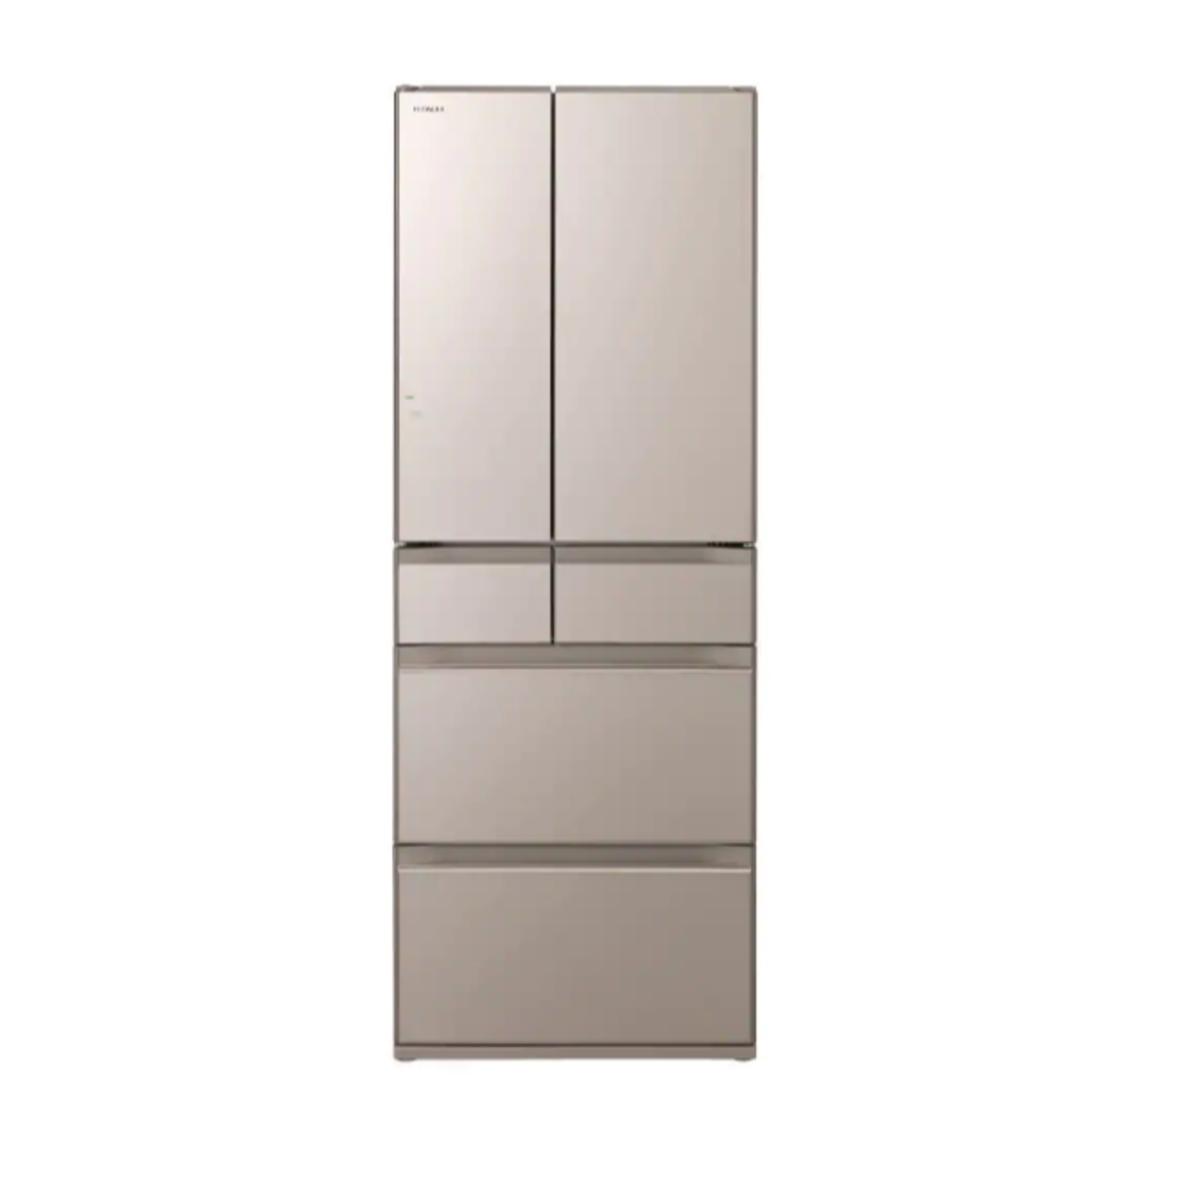 R-HW610JH(XN) - 463L Multi-Door Refrigerator ( Crystal Champagne )